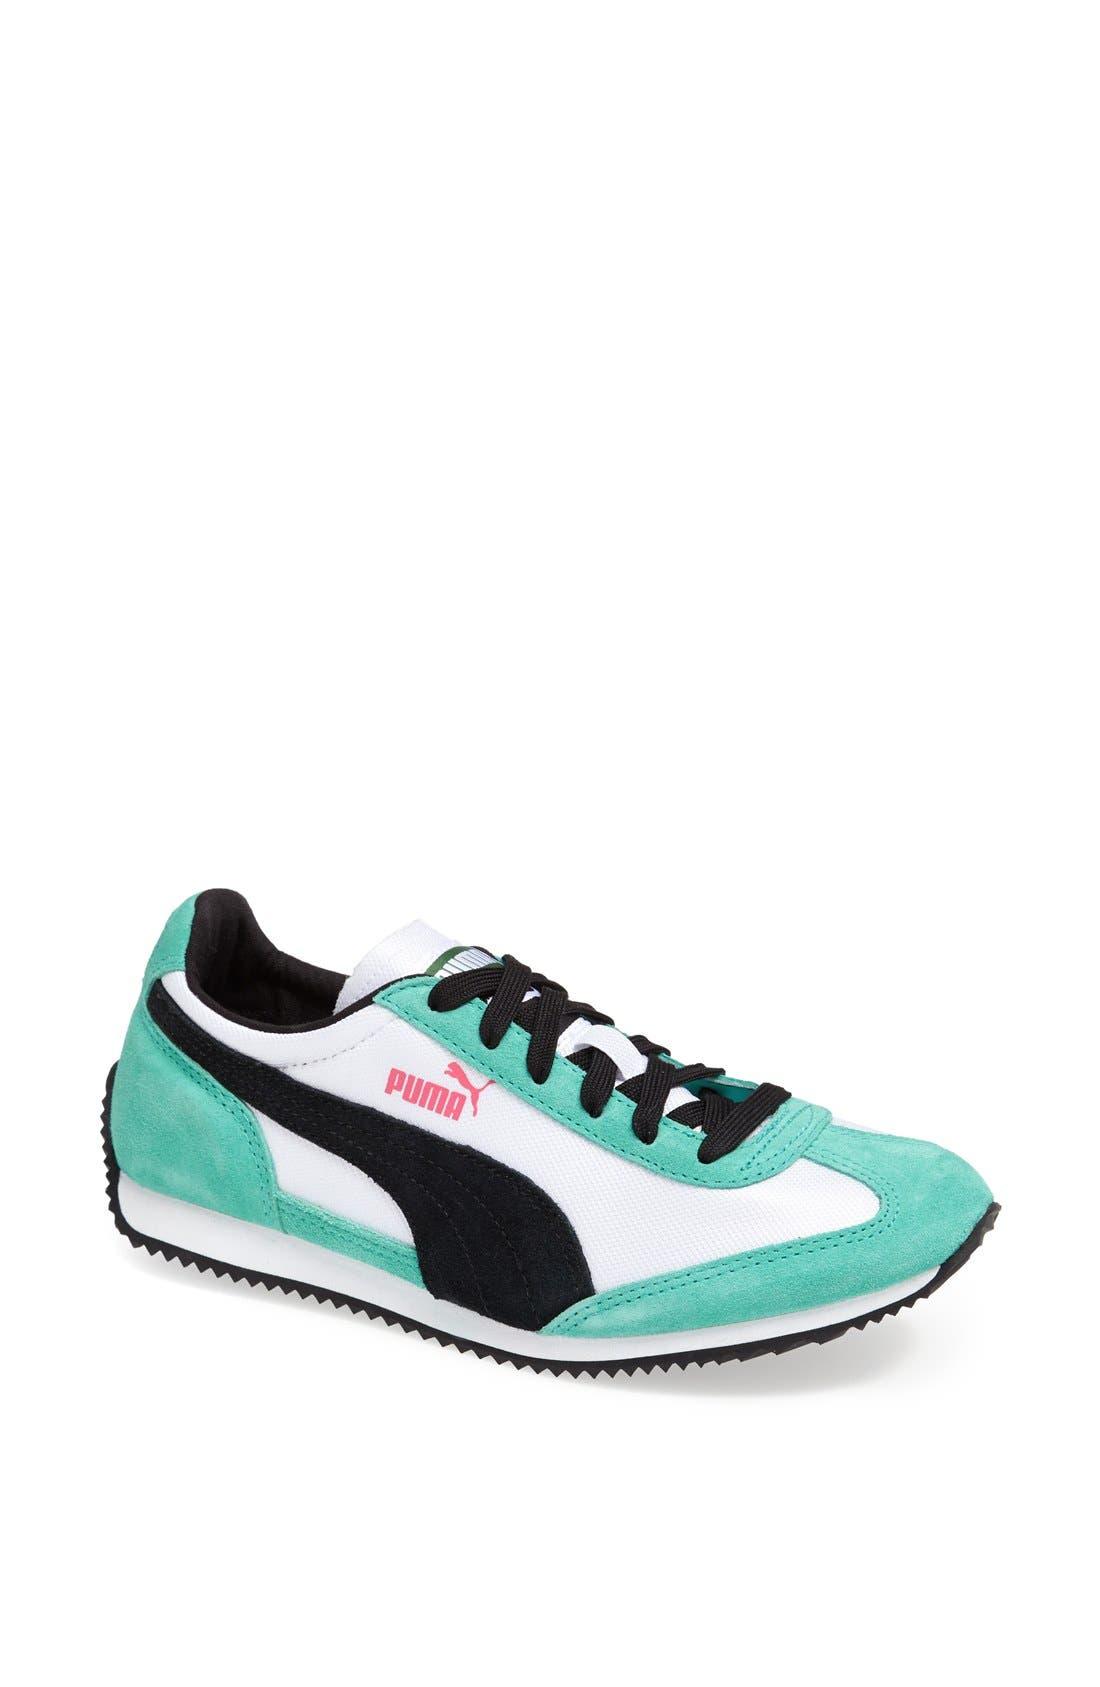 Main Image - PUMA 'SF77' Sneaker (Women)